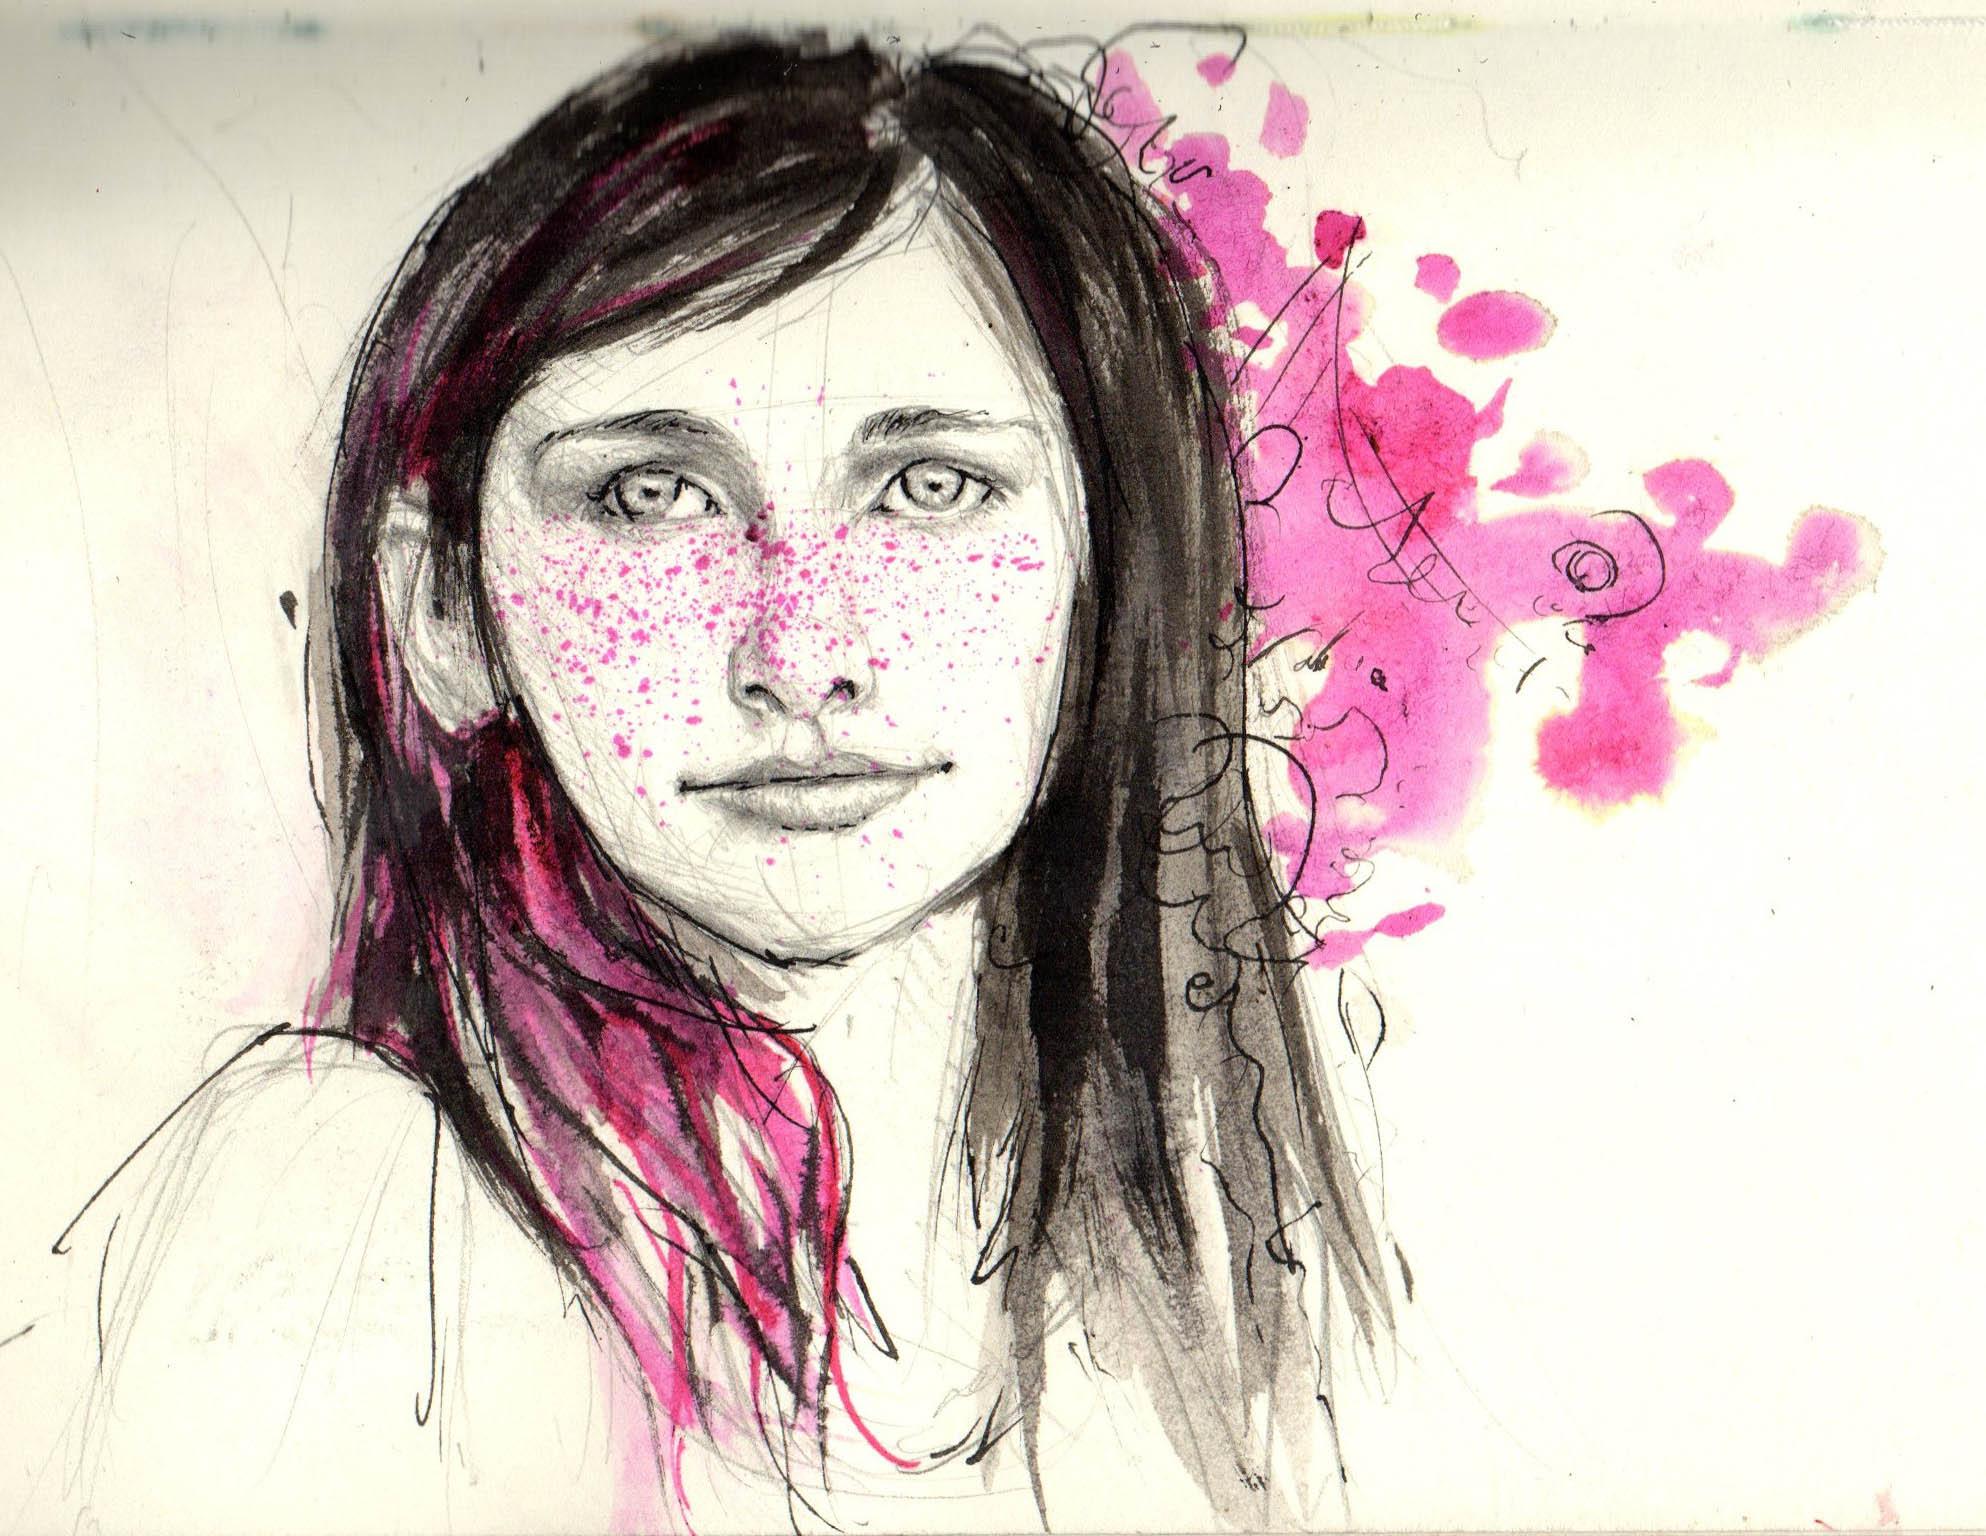 freckle girlc132.jpg